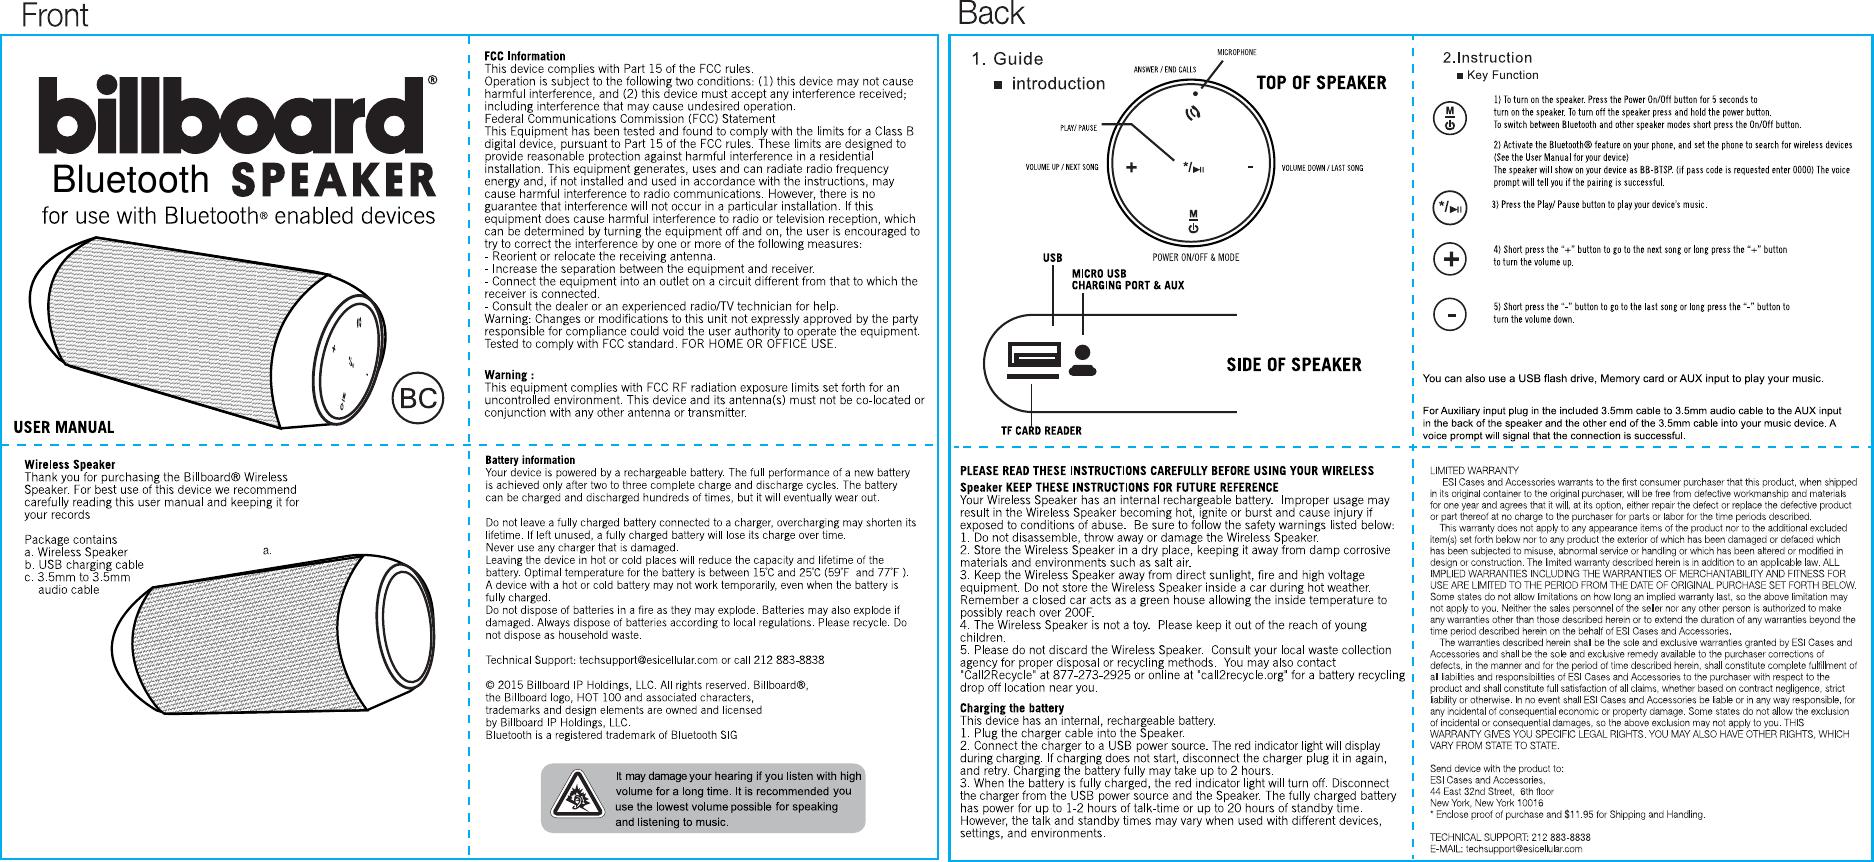 t2 bluetooth speaker instructions